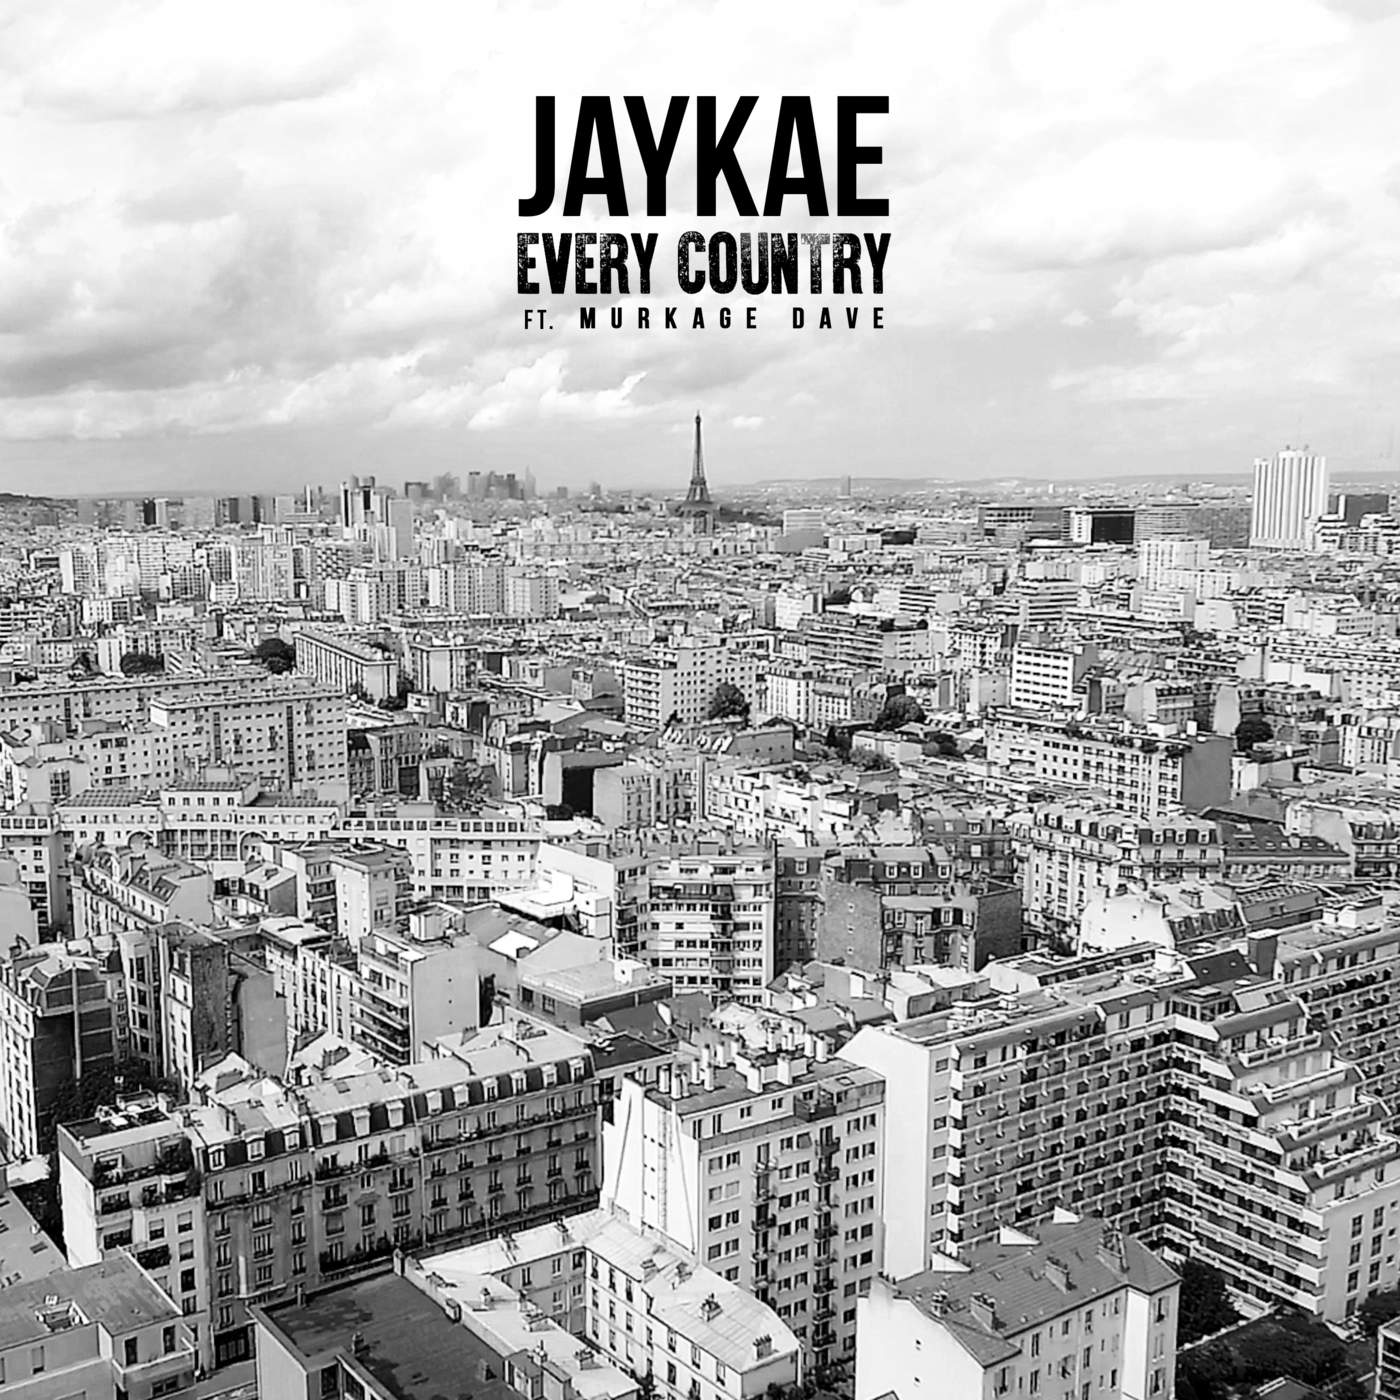 Every Country (Single) - JayKae - Murkage Dave